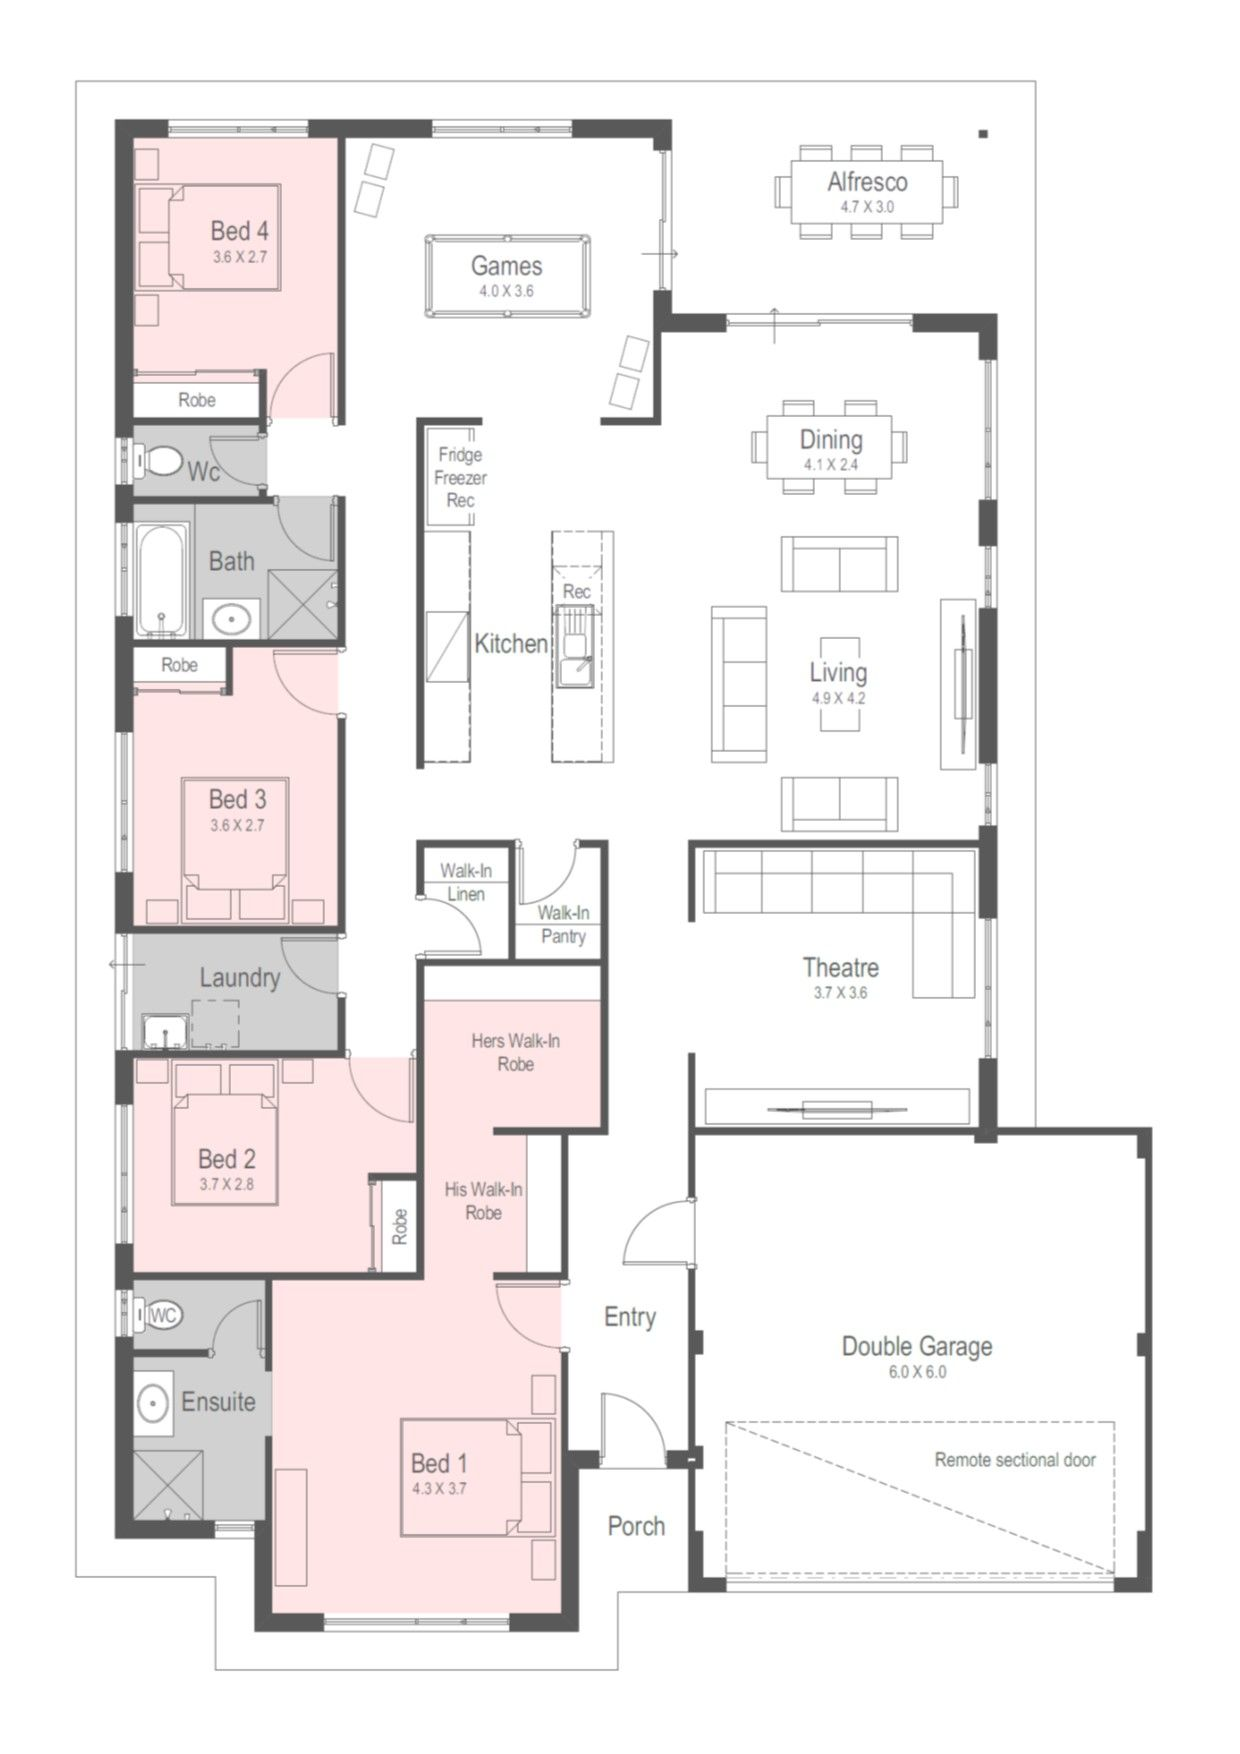 House Designs New Home Designs Perth Homebuyers Centre House Design New Home Designs Home Design Floor Plans